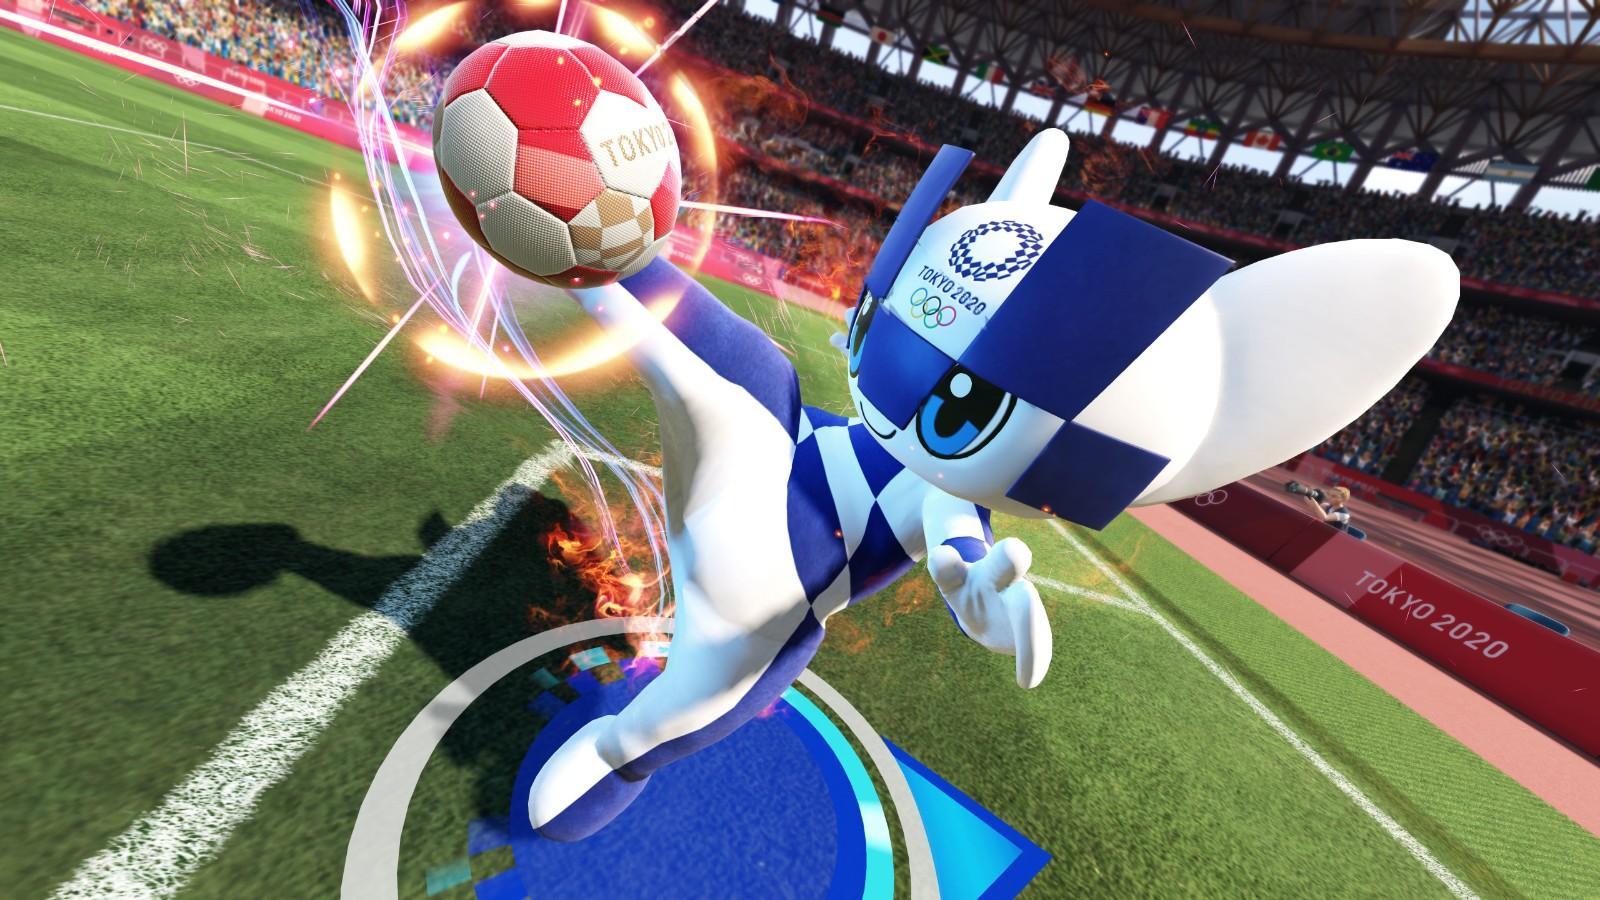 Steam免费好玩的游戏有哪些?庆祝奥运会开幕免费玩《东京奥运官方游戏》